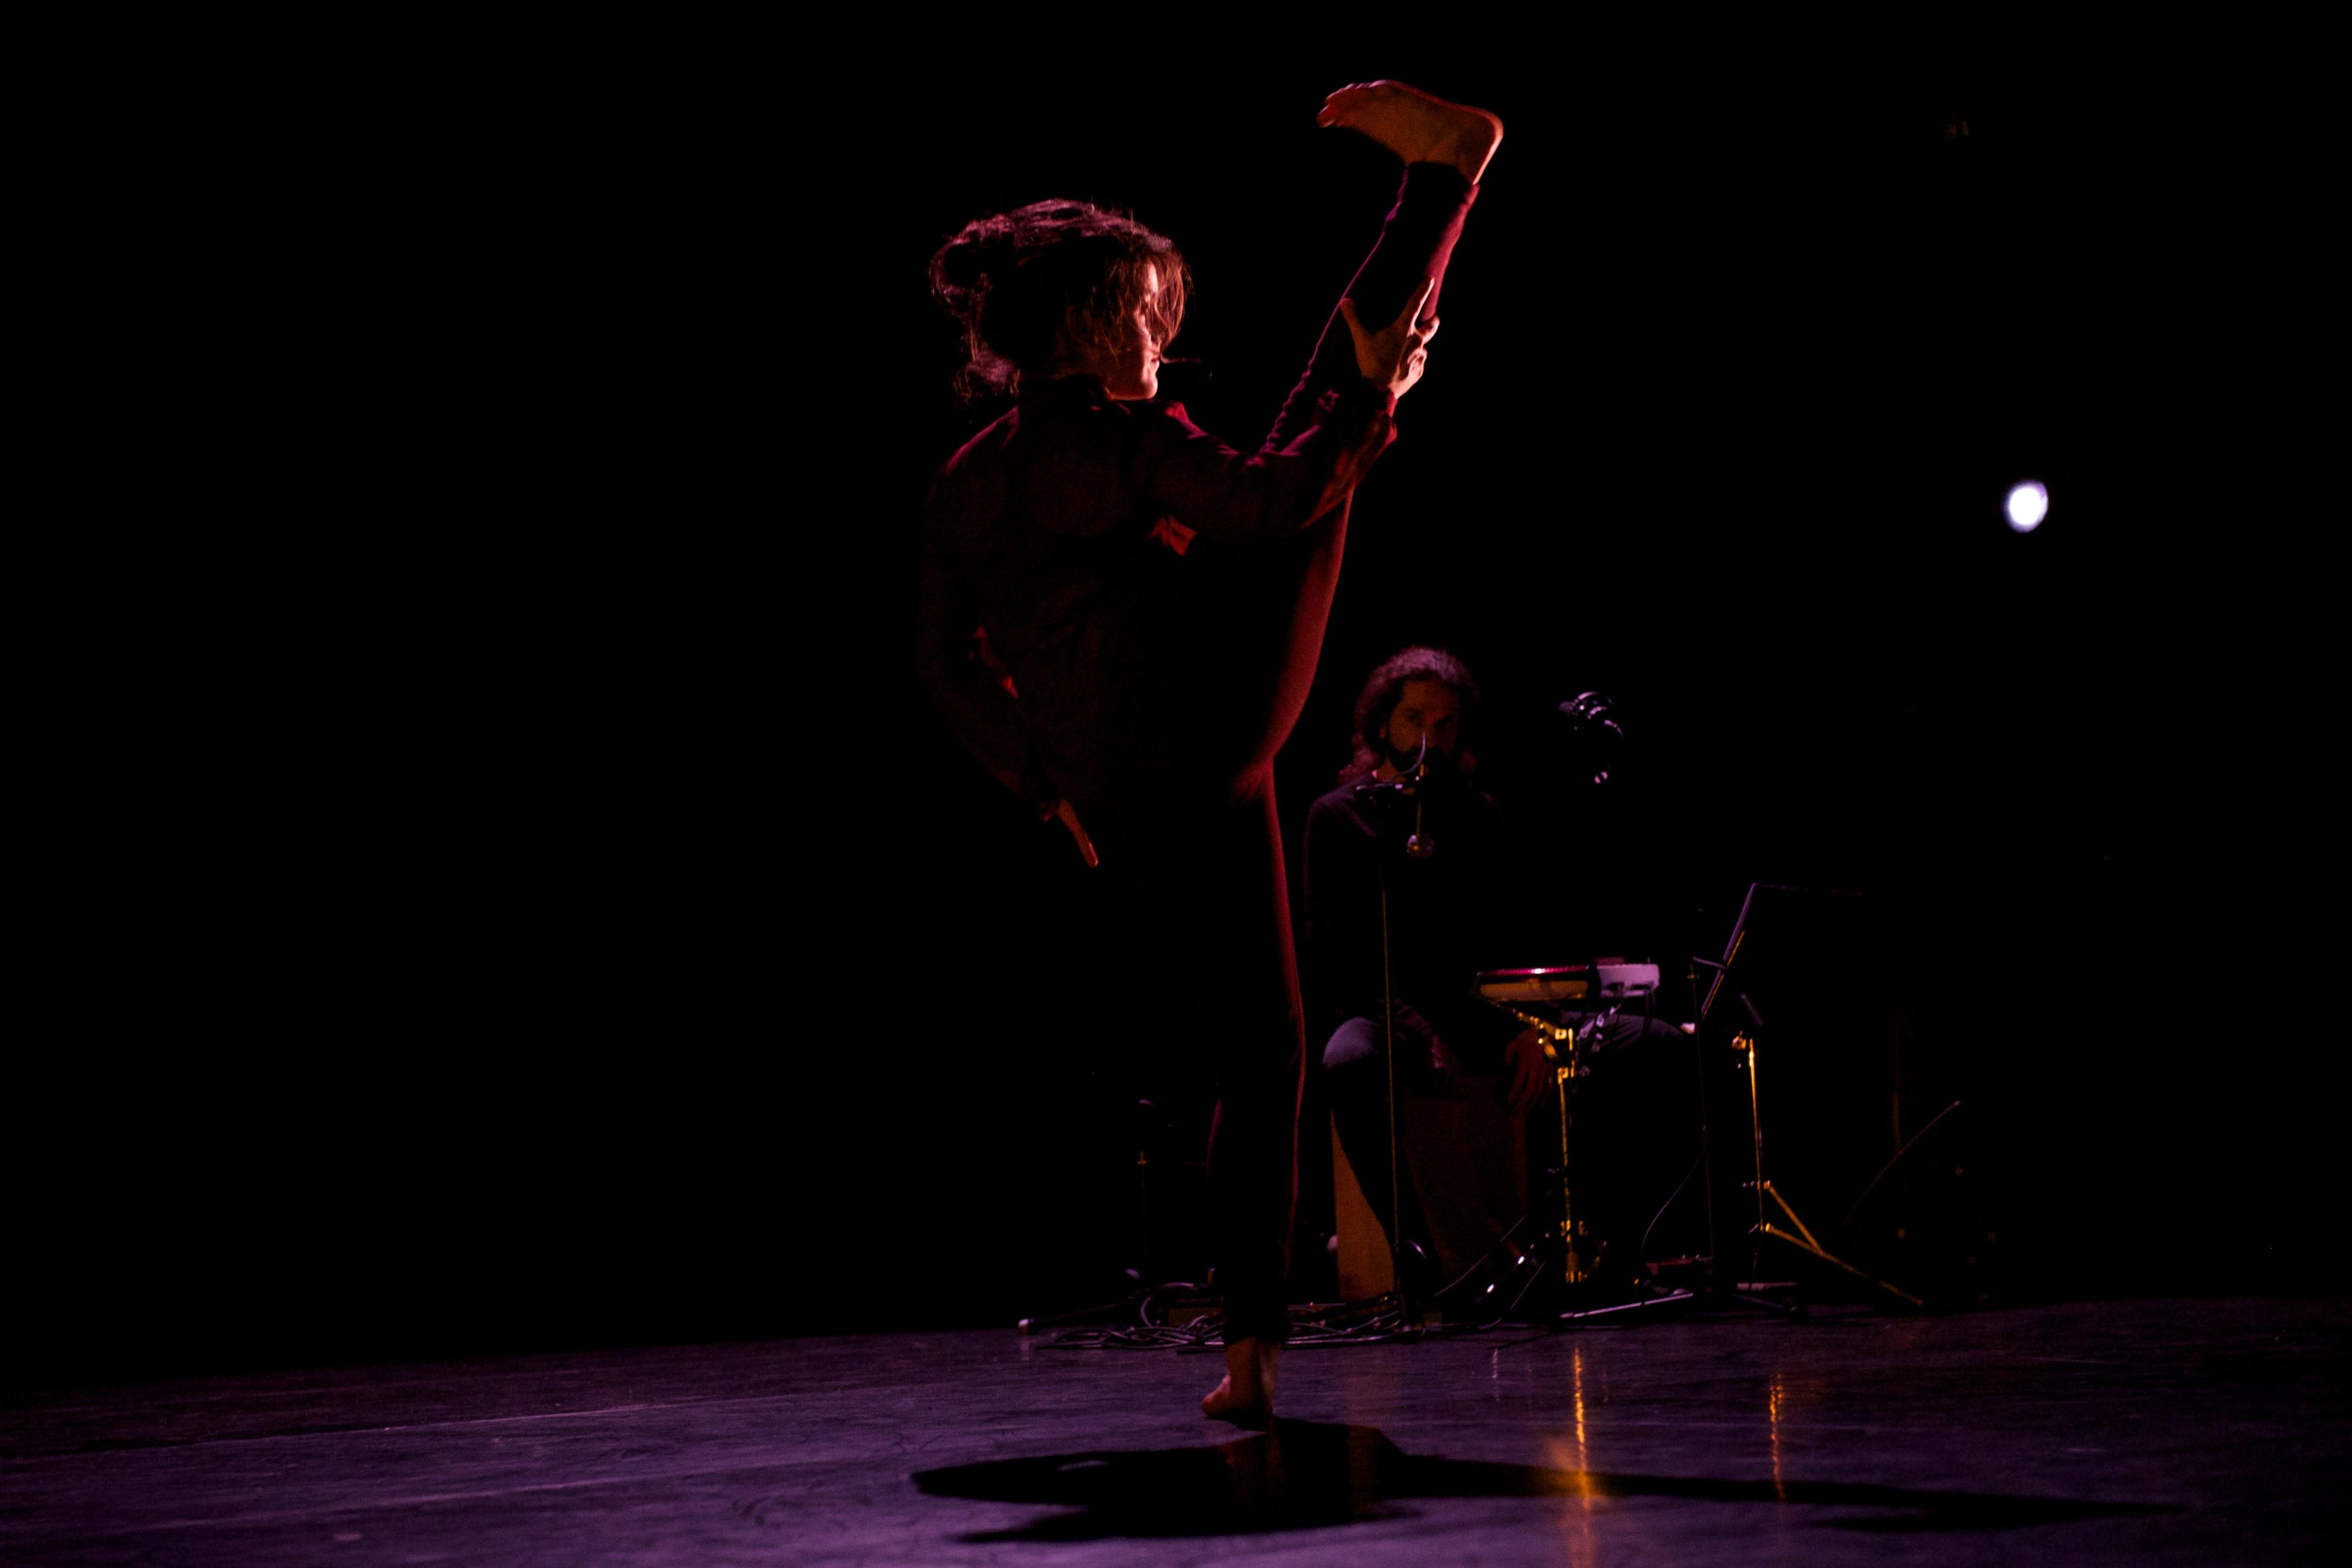 Estela Merlos - My Dust Will Tell